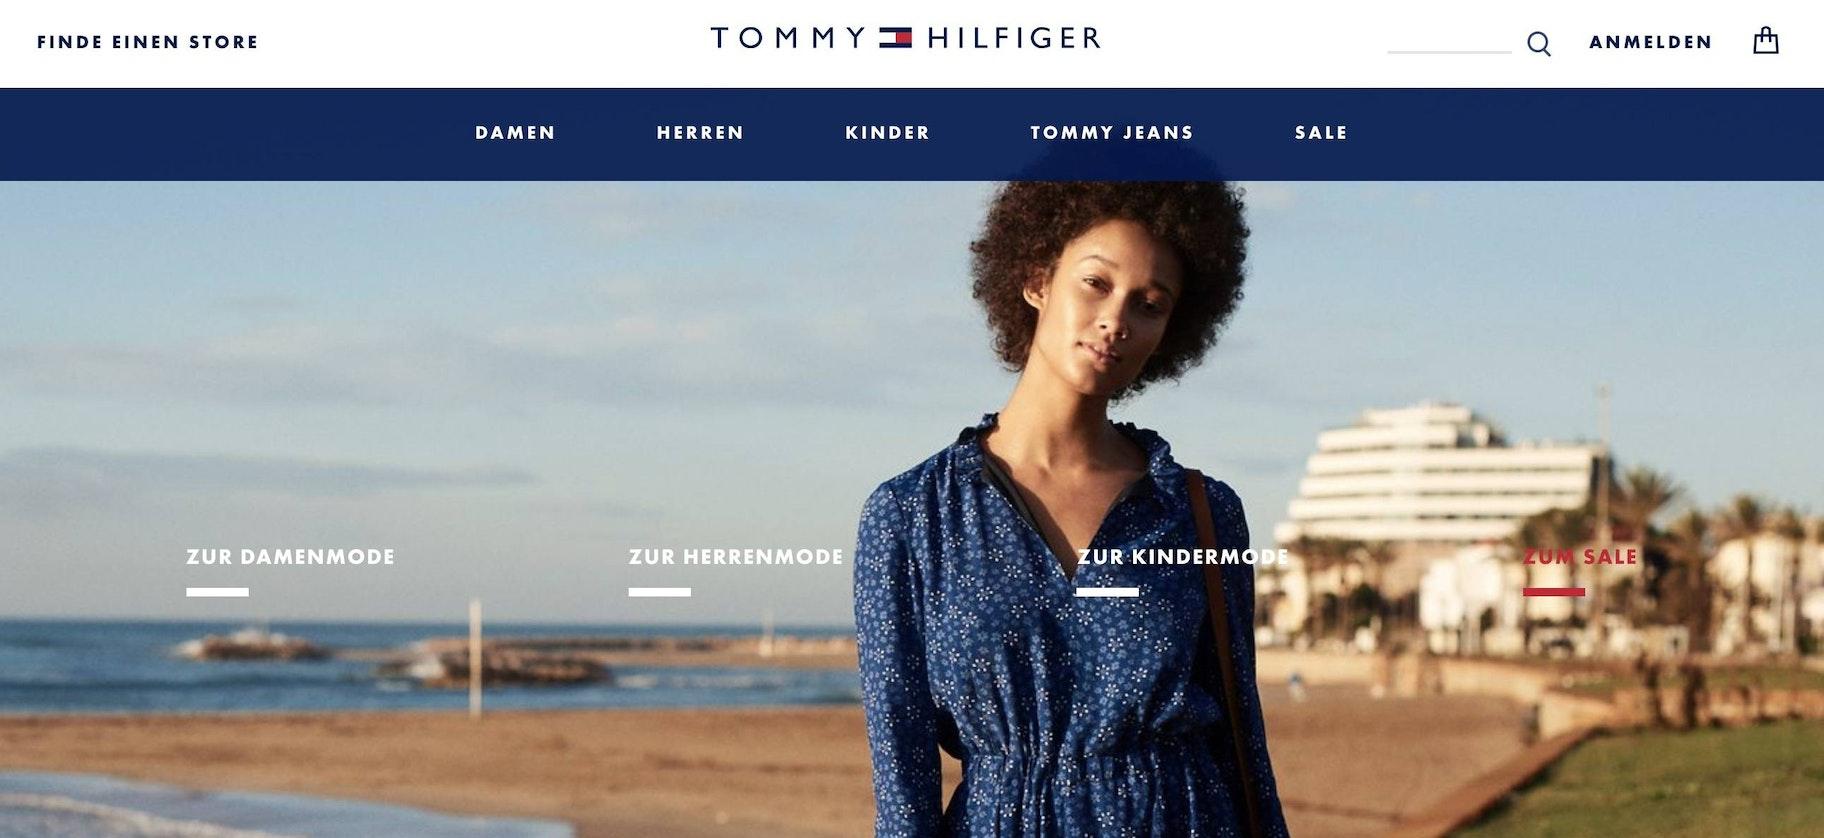 Tommy Hilfiger online store